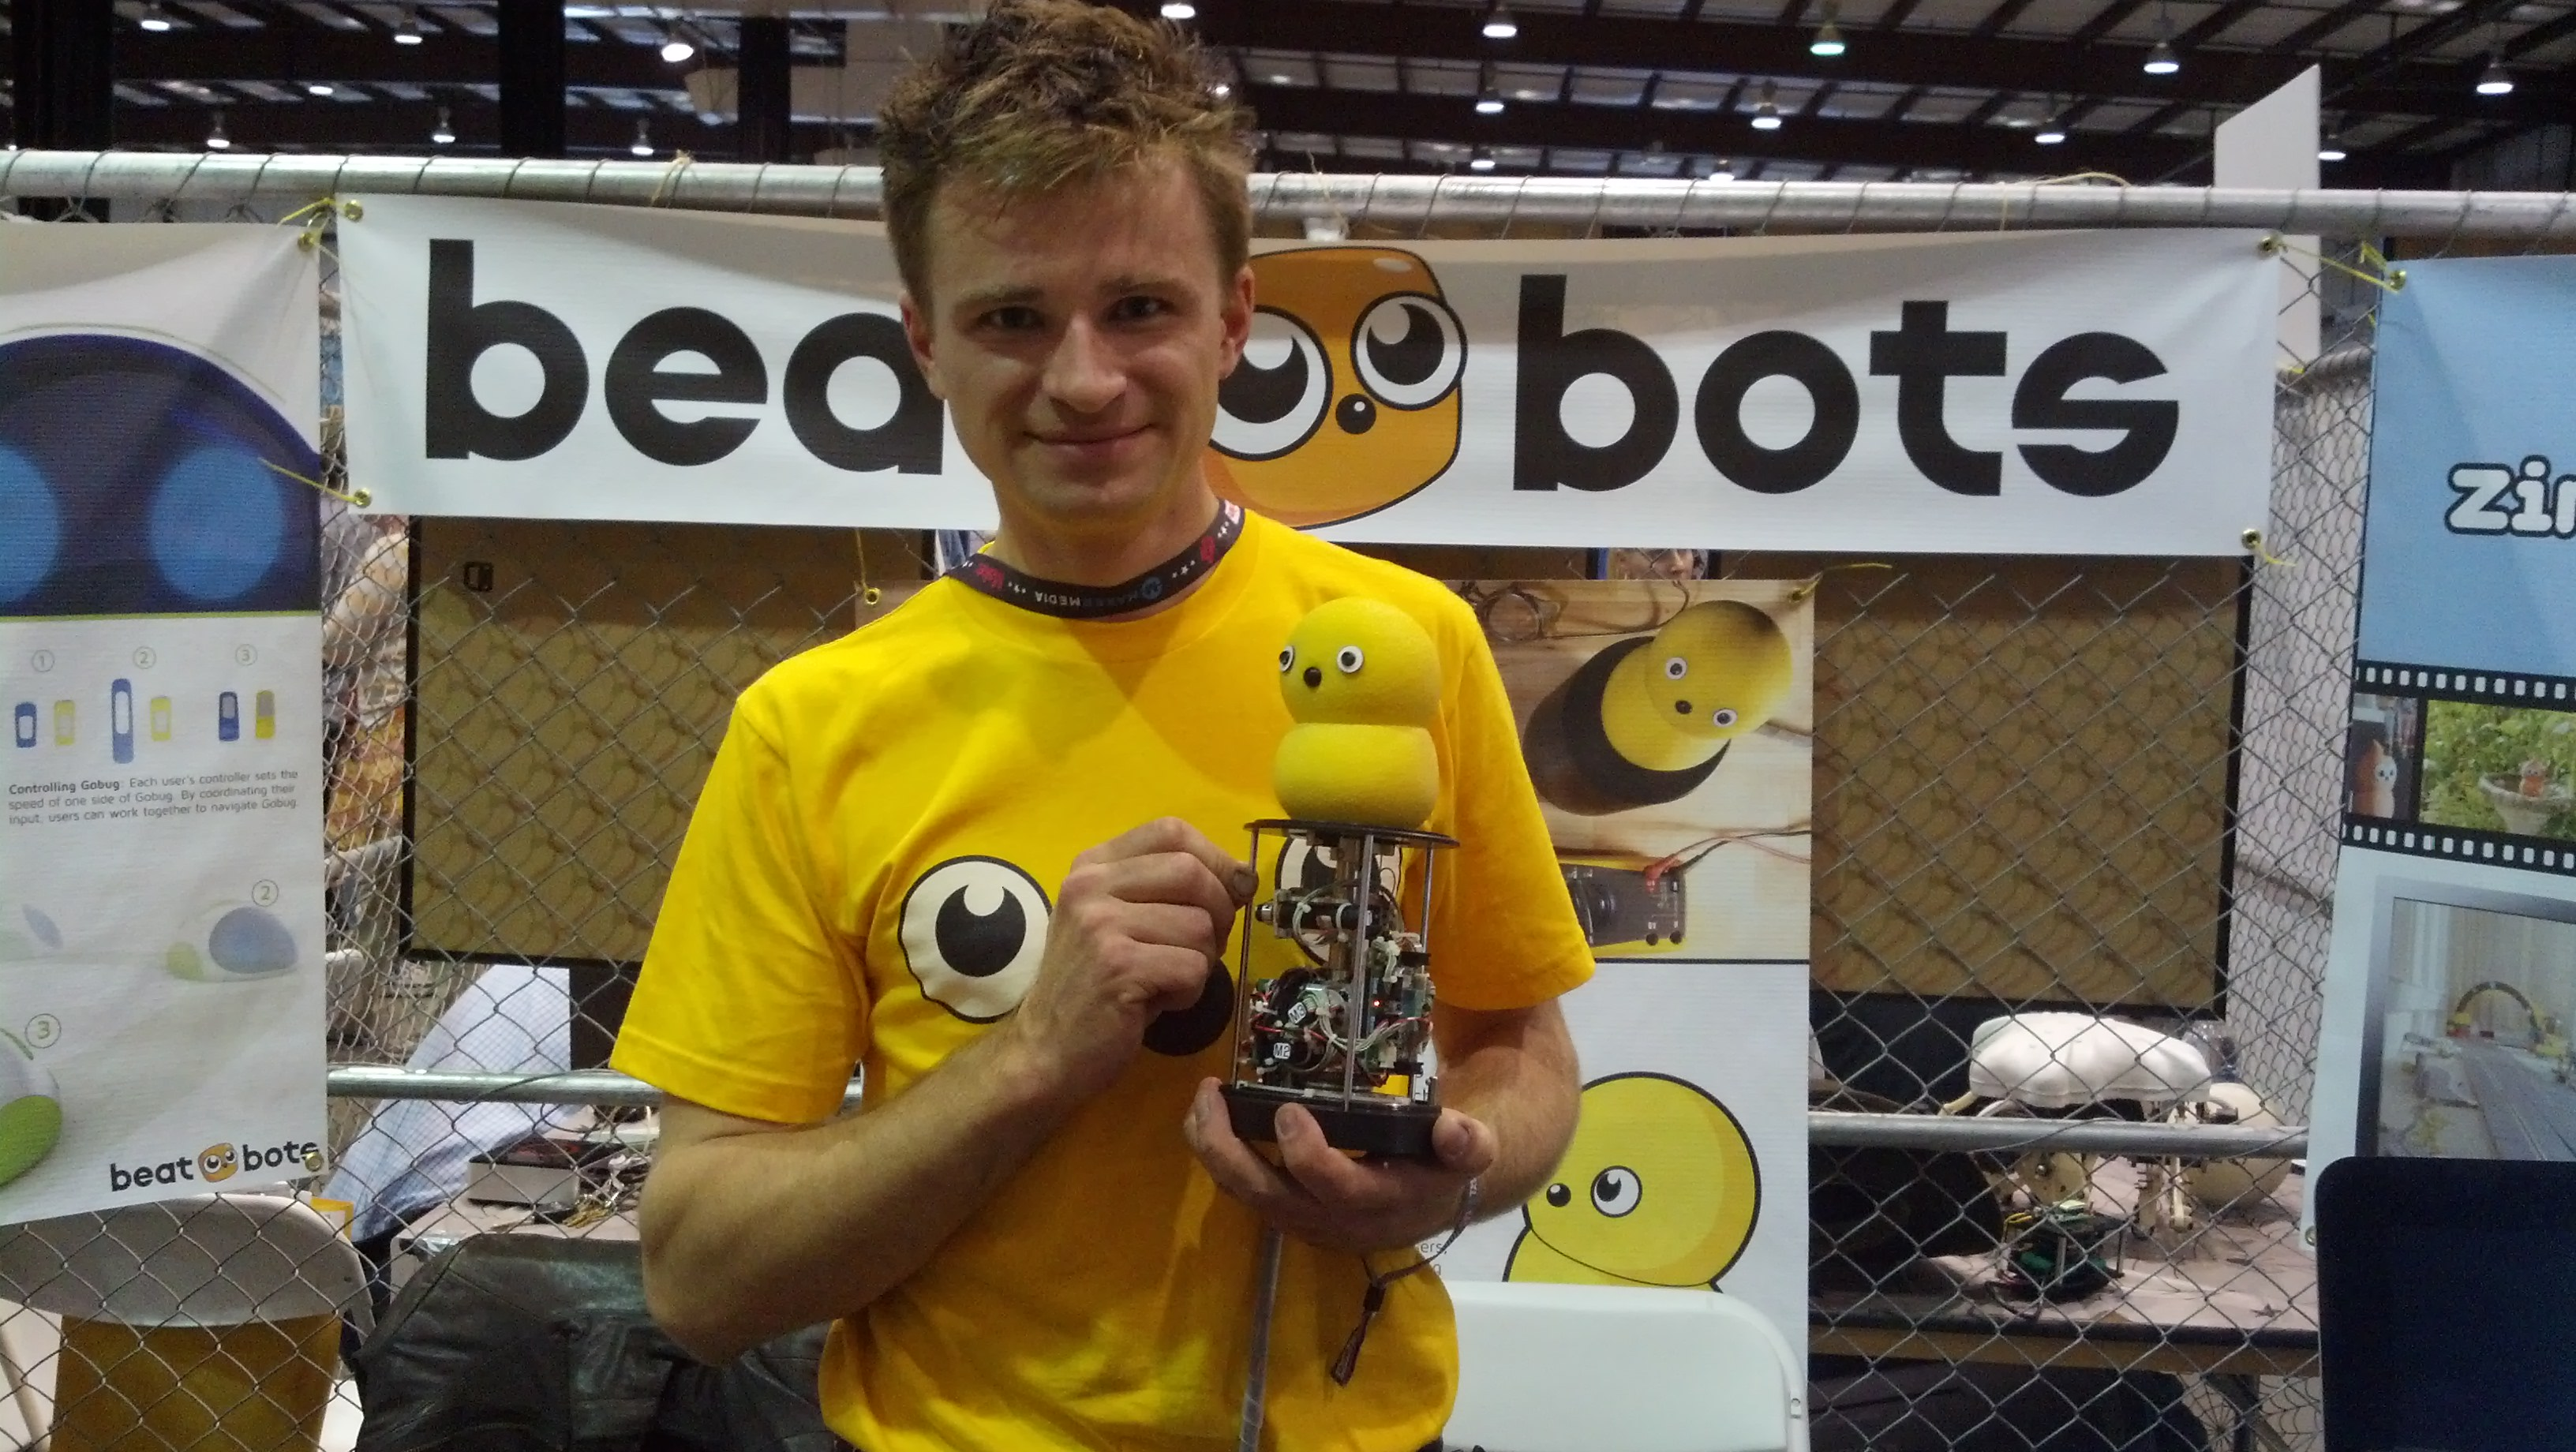 BeatBots Continues Socially Conscious Innovation